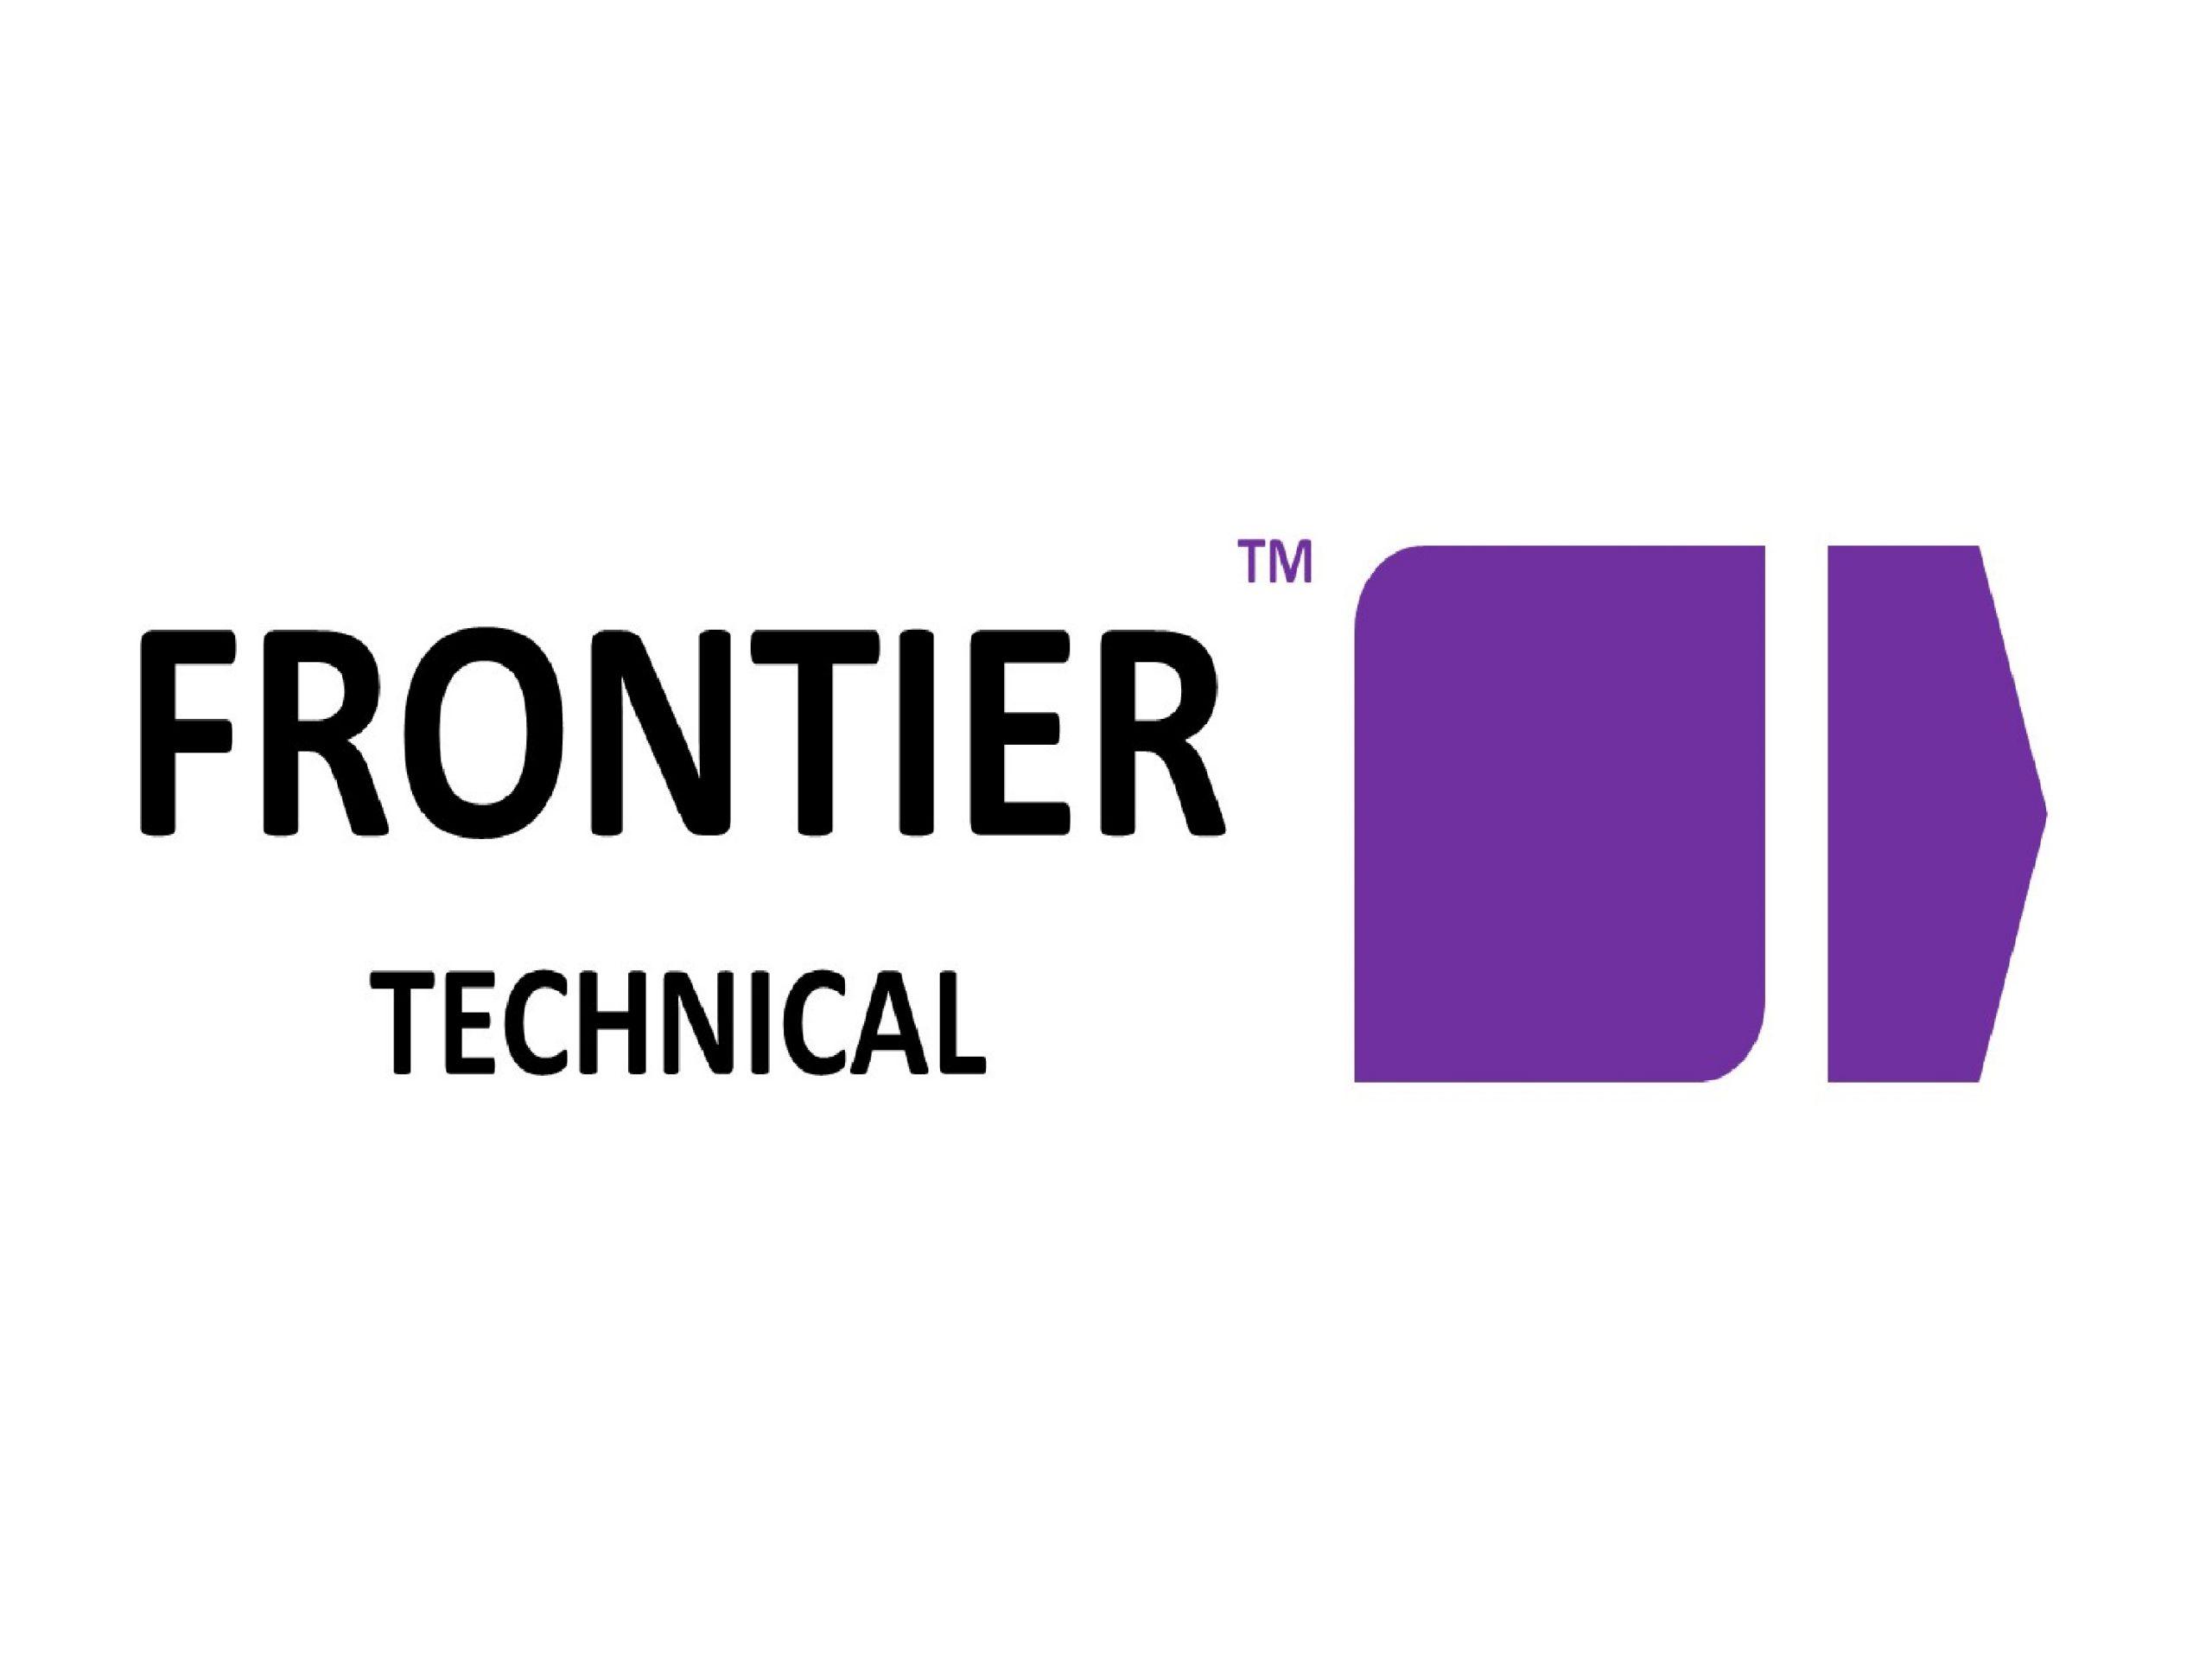 Frontier Technical logo